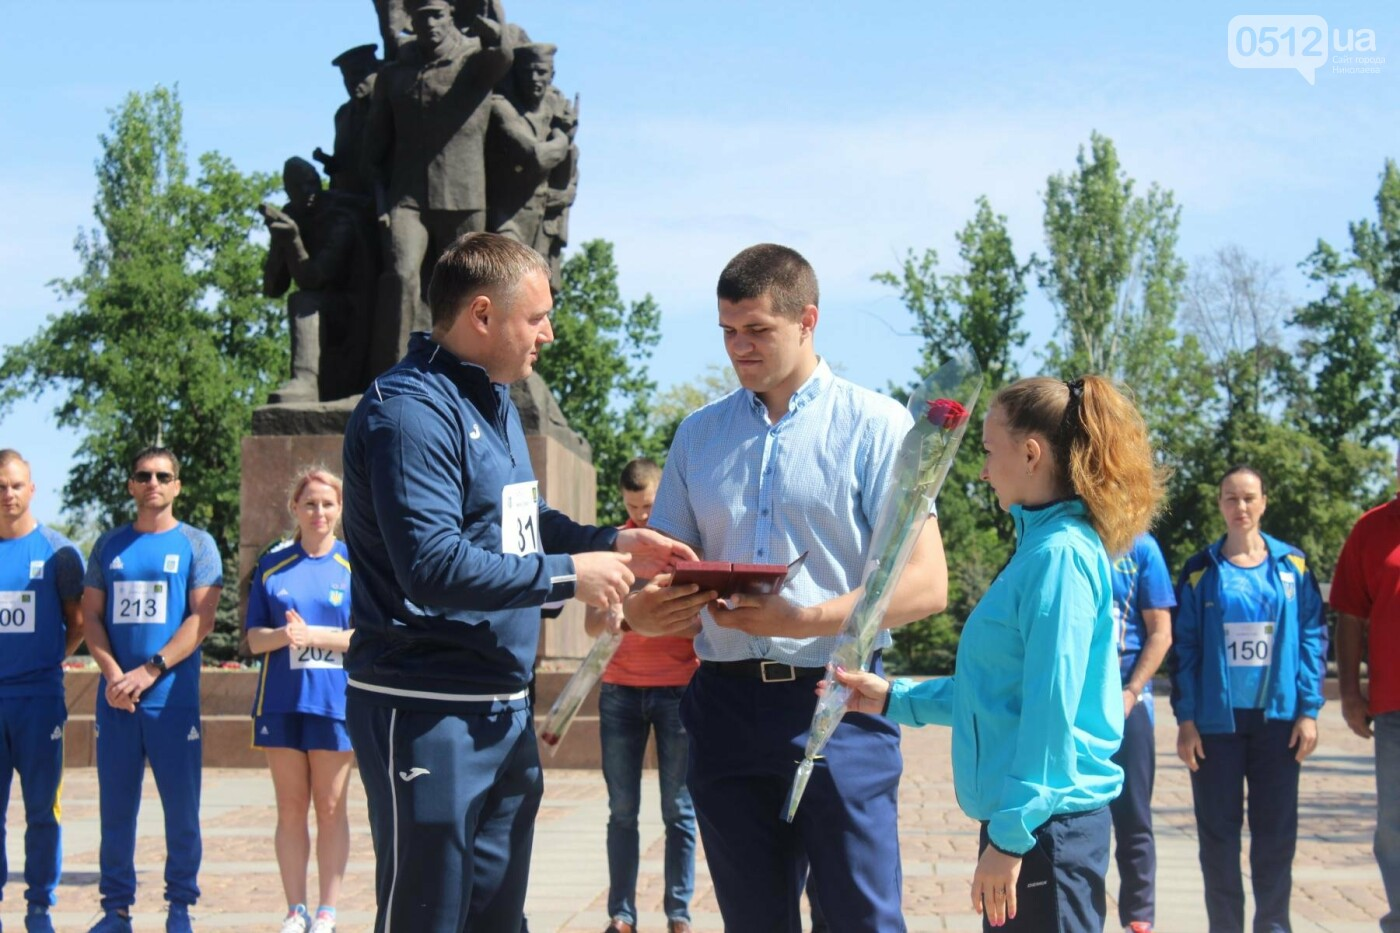 В Николаеве на день олимпийца спортсменам вручили награды и ключи от нового автобуса, - ФОТО , фото-5